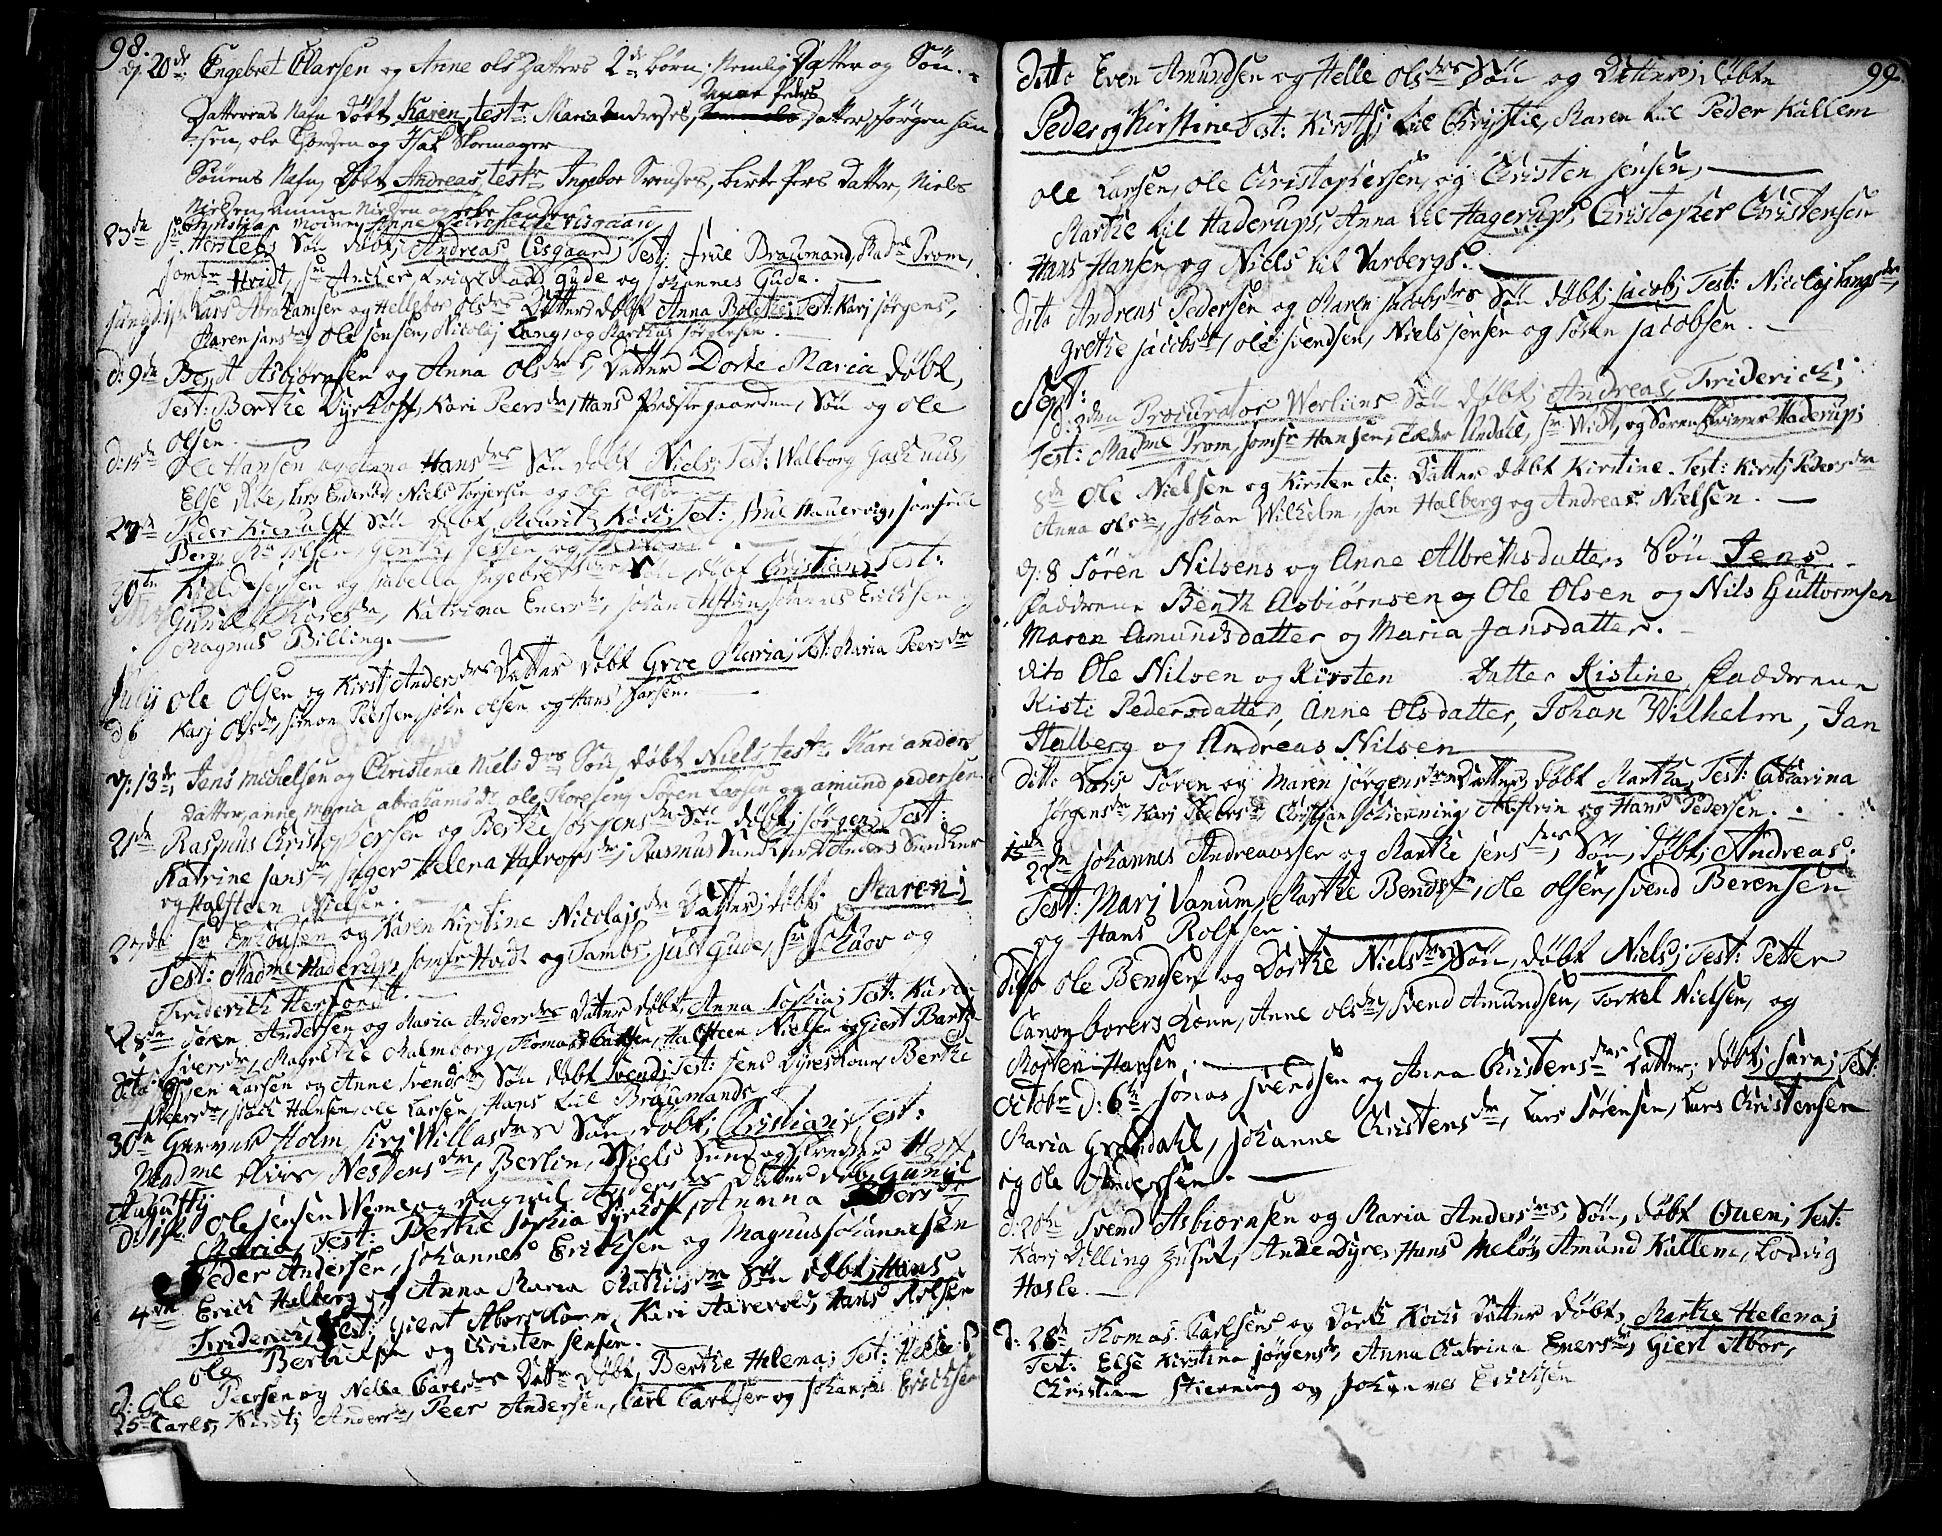 SAO, Moss prestekontor Kirkebøker, F/Fa/Faa/L0002: Ministerialbok nr. I 2, 1753-1779, s. 98-99